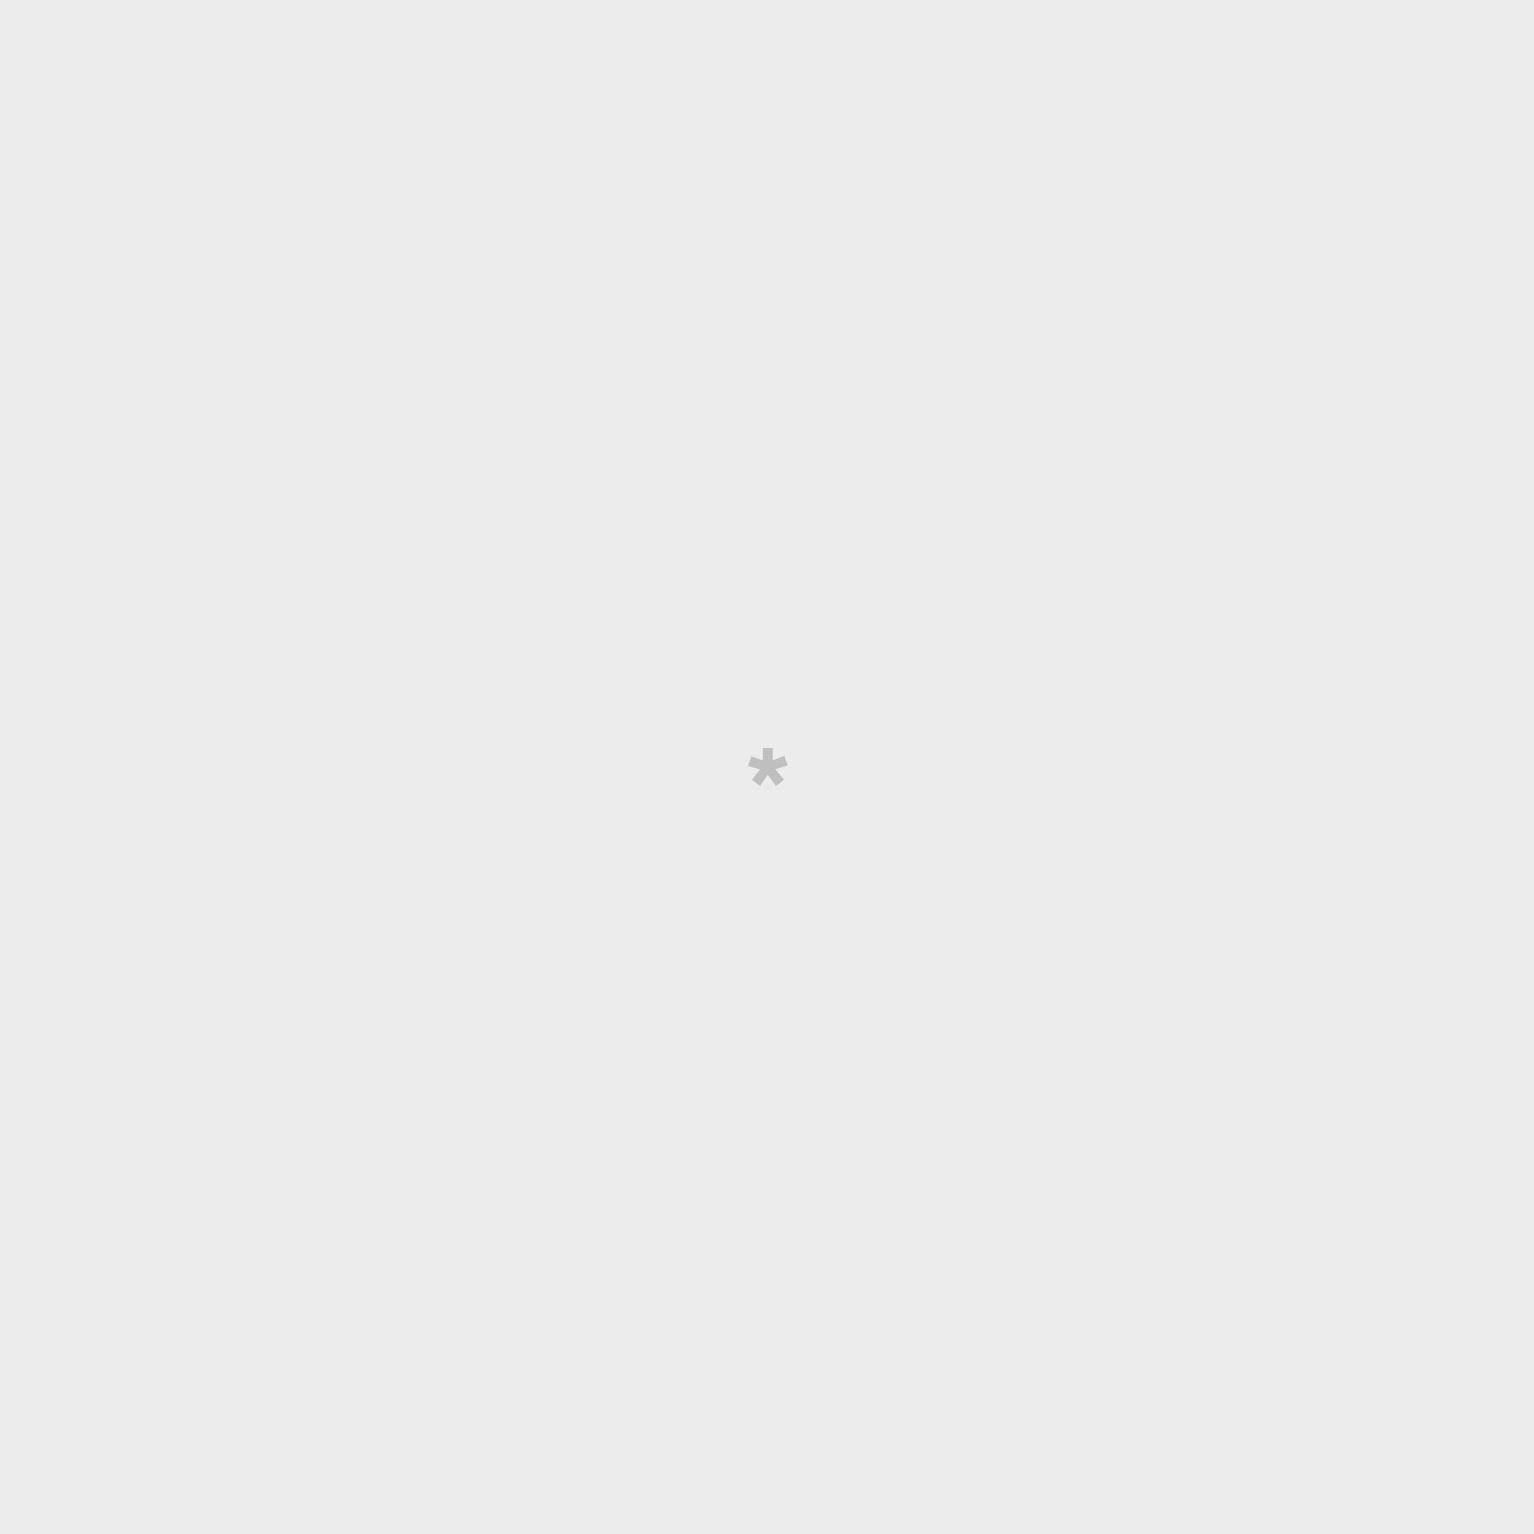 Álbum Fotos - Tu, eu e todas as coisas bonitas que vivemos